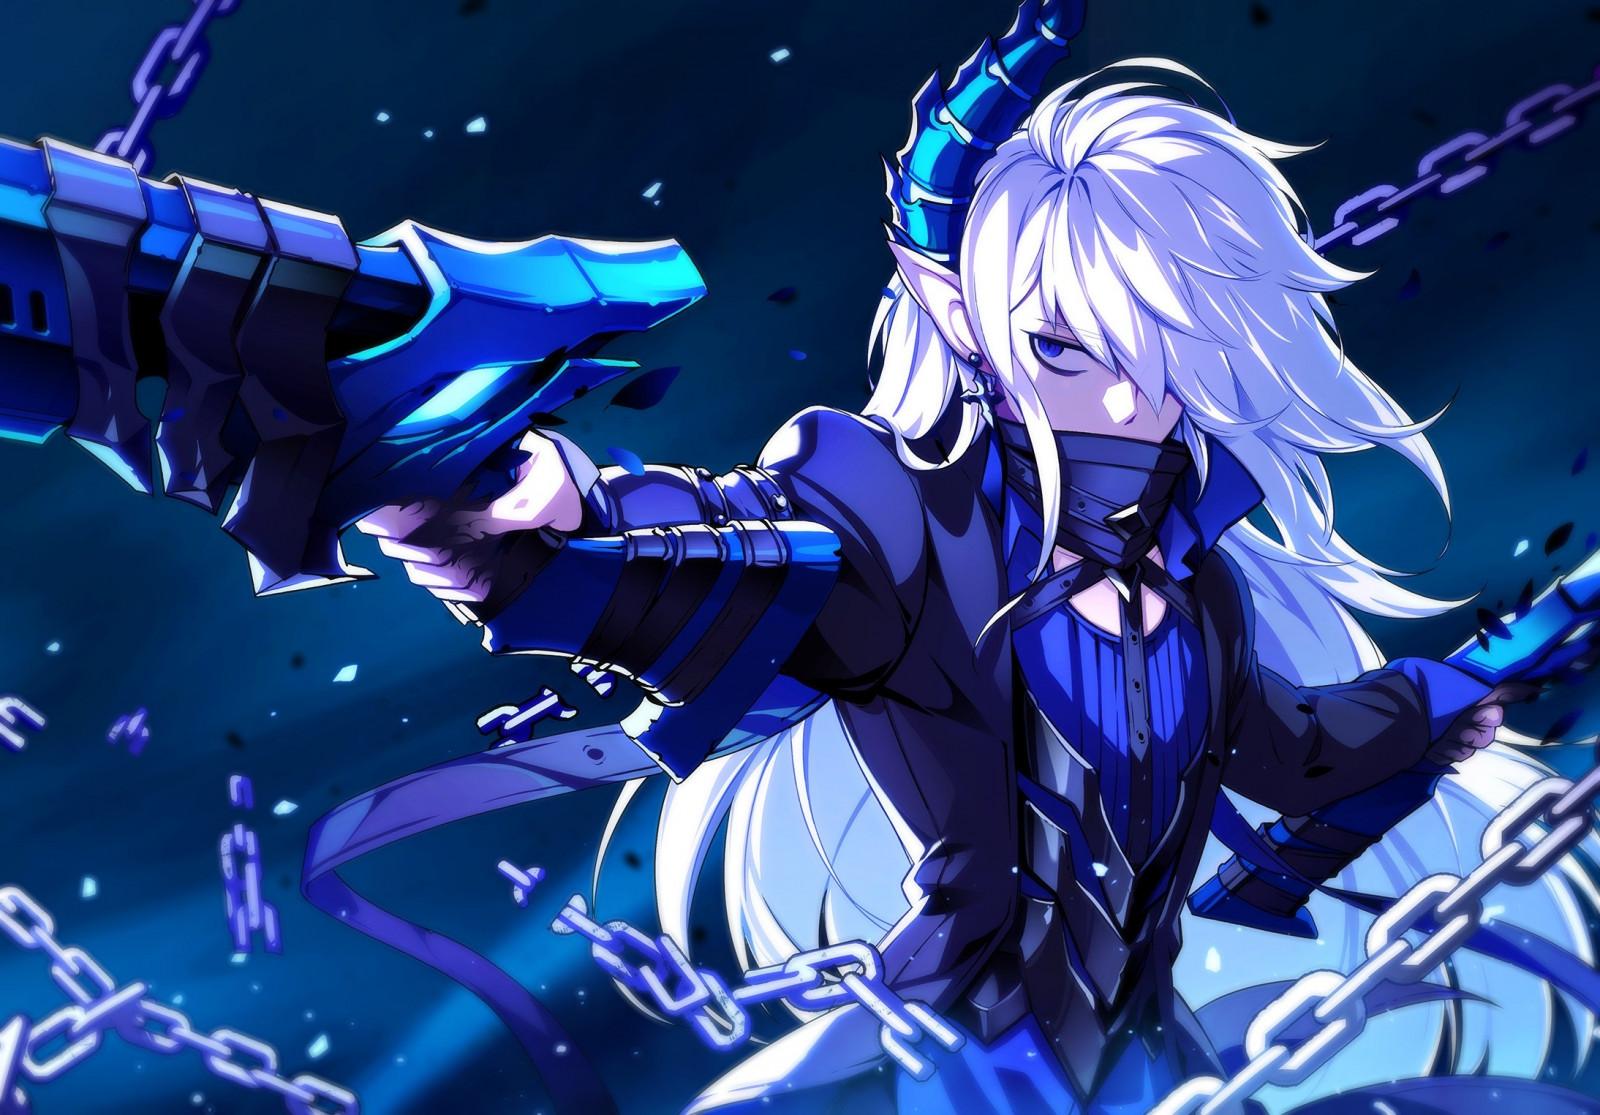 Wallpaper Gun Long Hair White Hair Anime Girls Blue Eyes